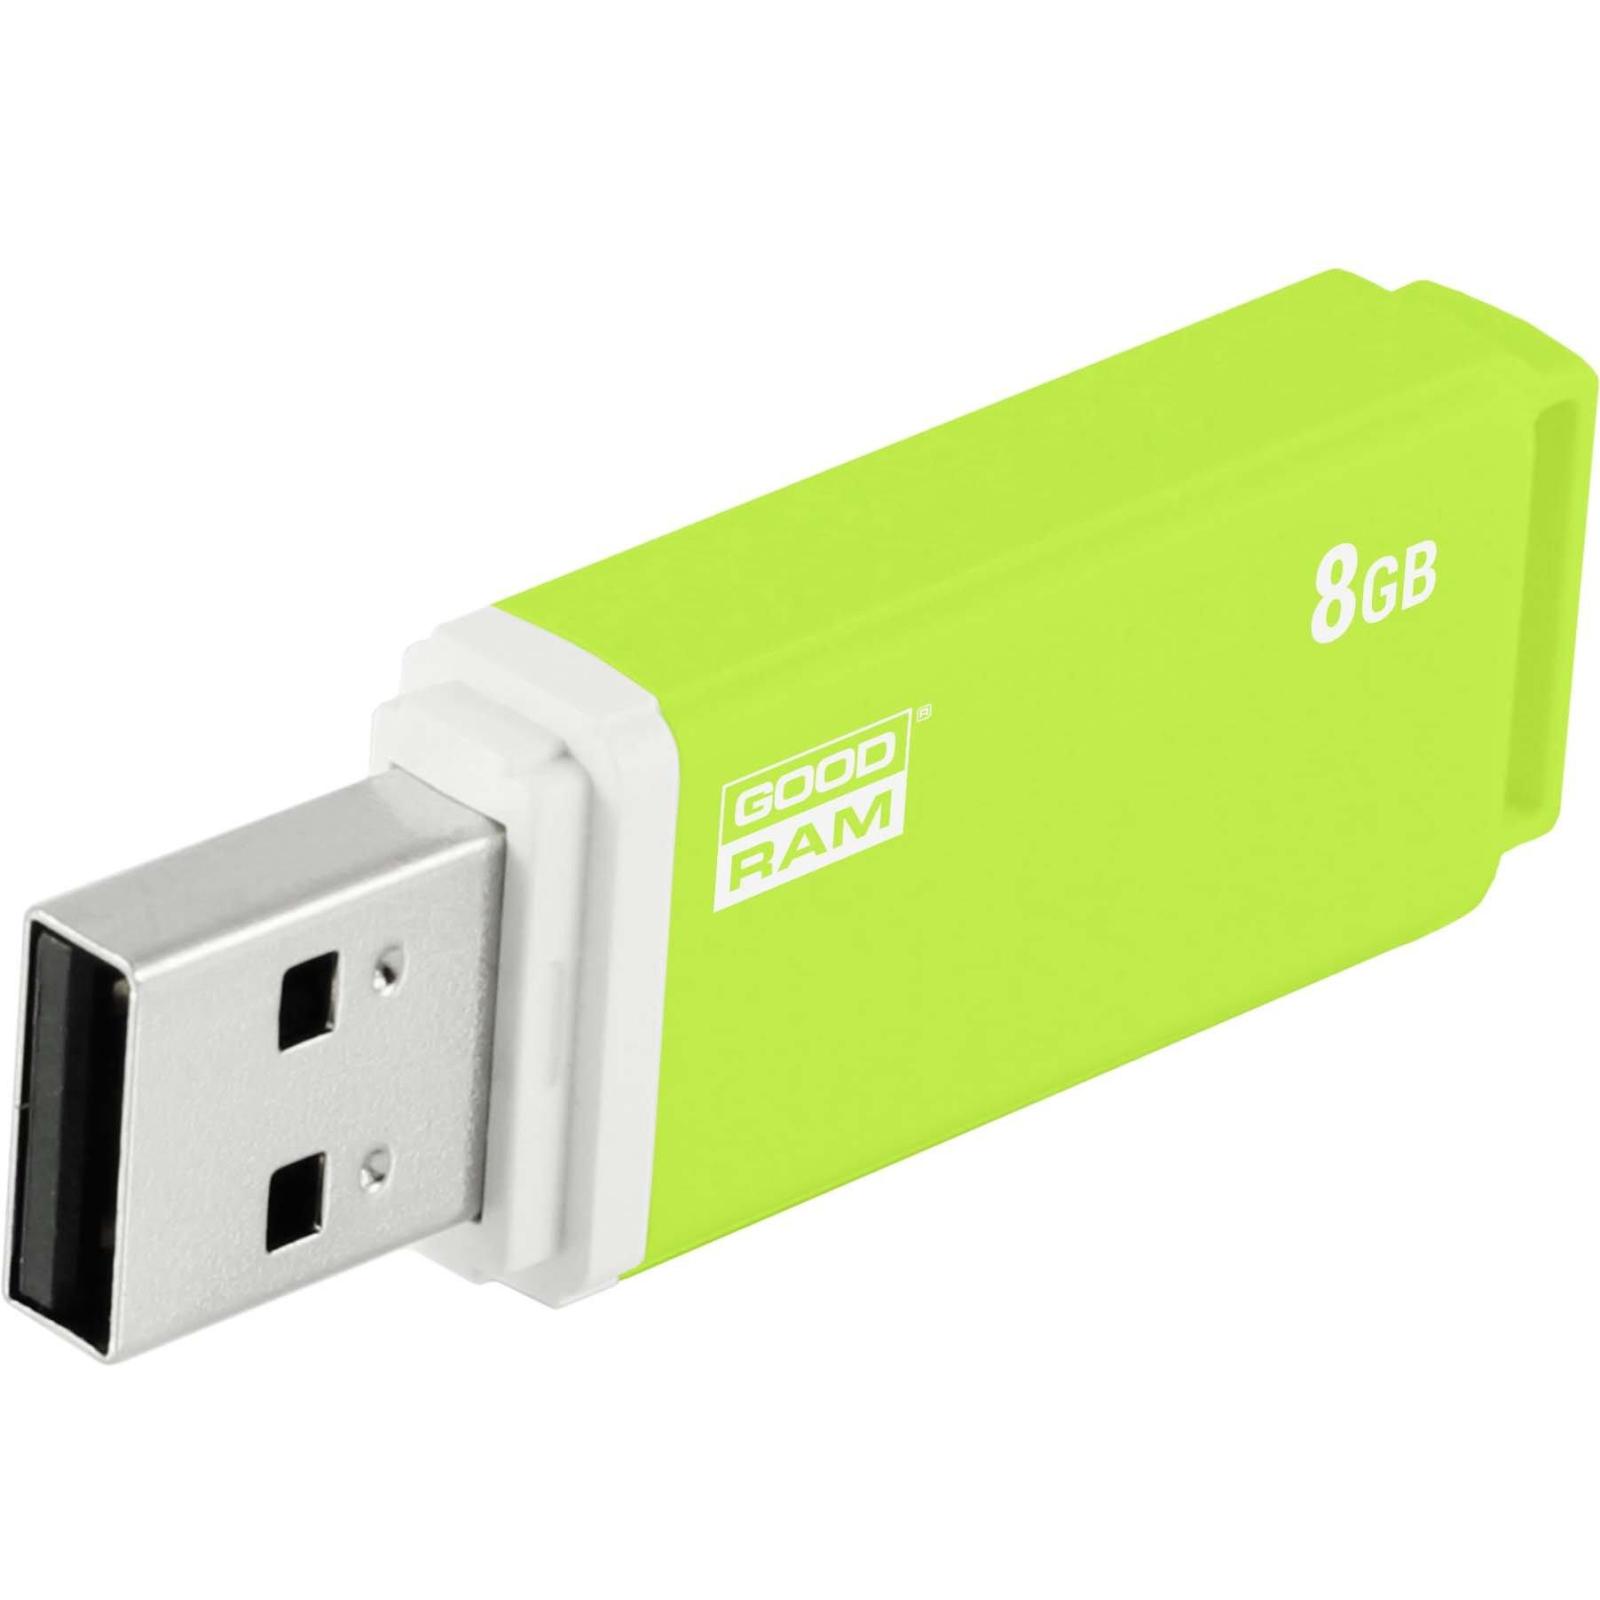 USB флеш накопитель Goodram 8GB UMO2 Green USB 2.0 (UMO2-0080G0R11) изображение 5